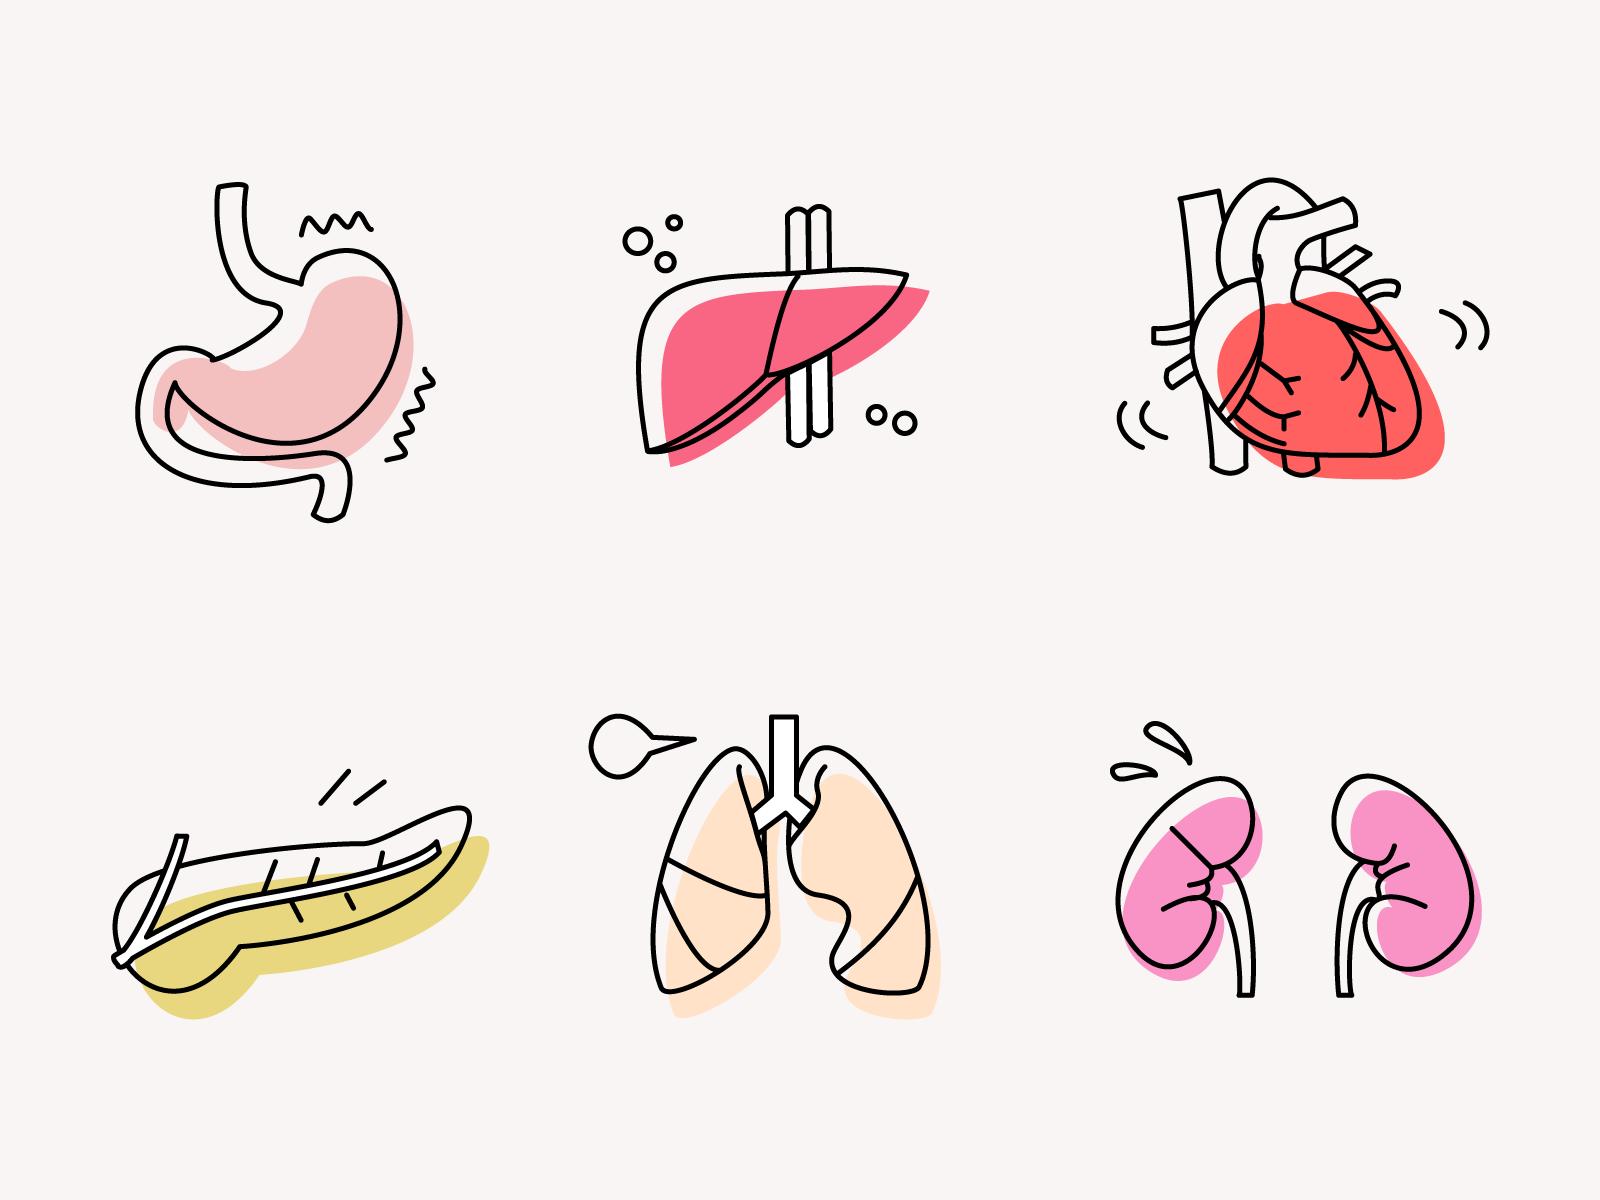 Human Organs Human Organ Medical Illustration Medical Icon